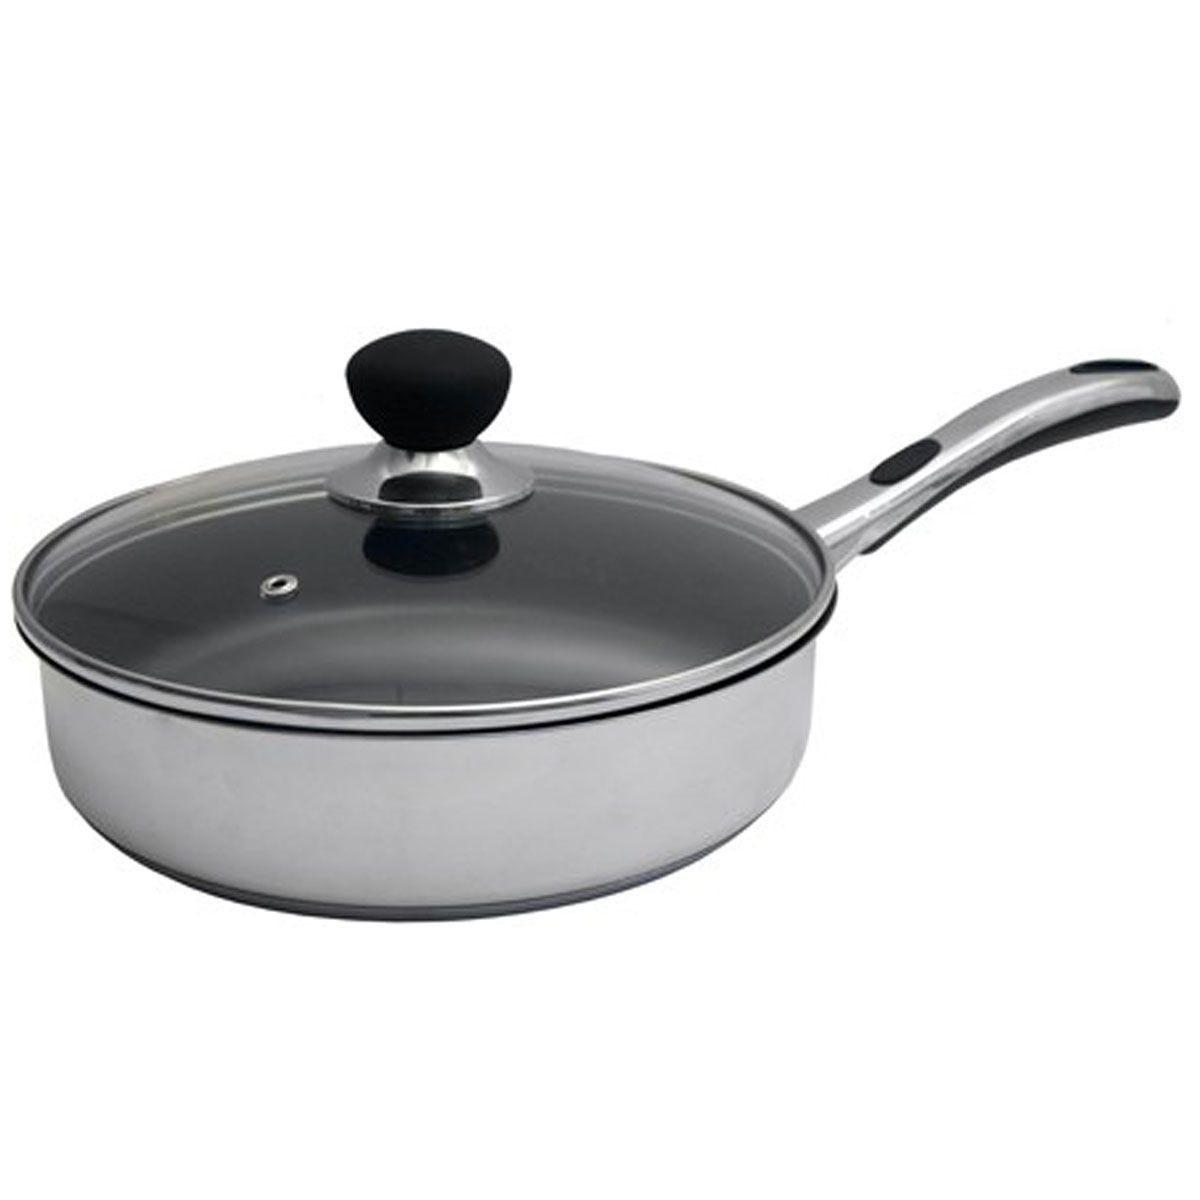 Sabichi Living Easy Grip 24cm Frying Pan